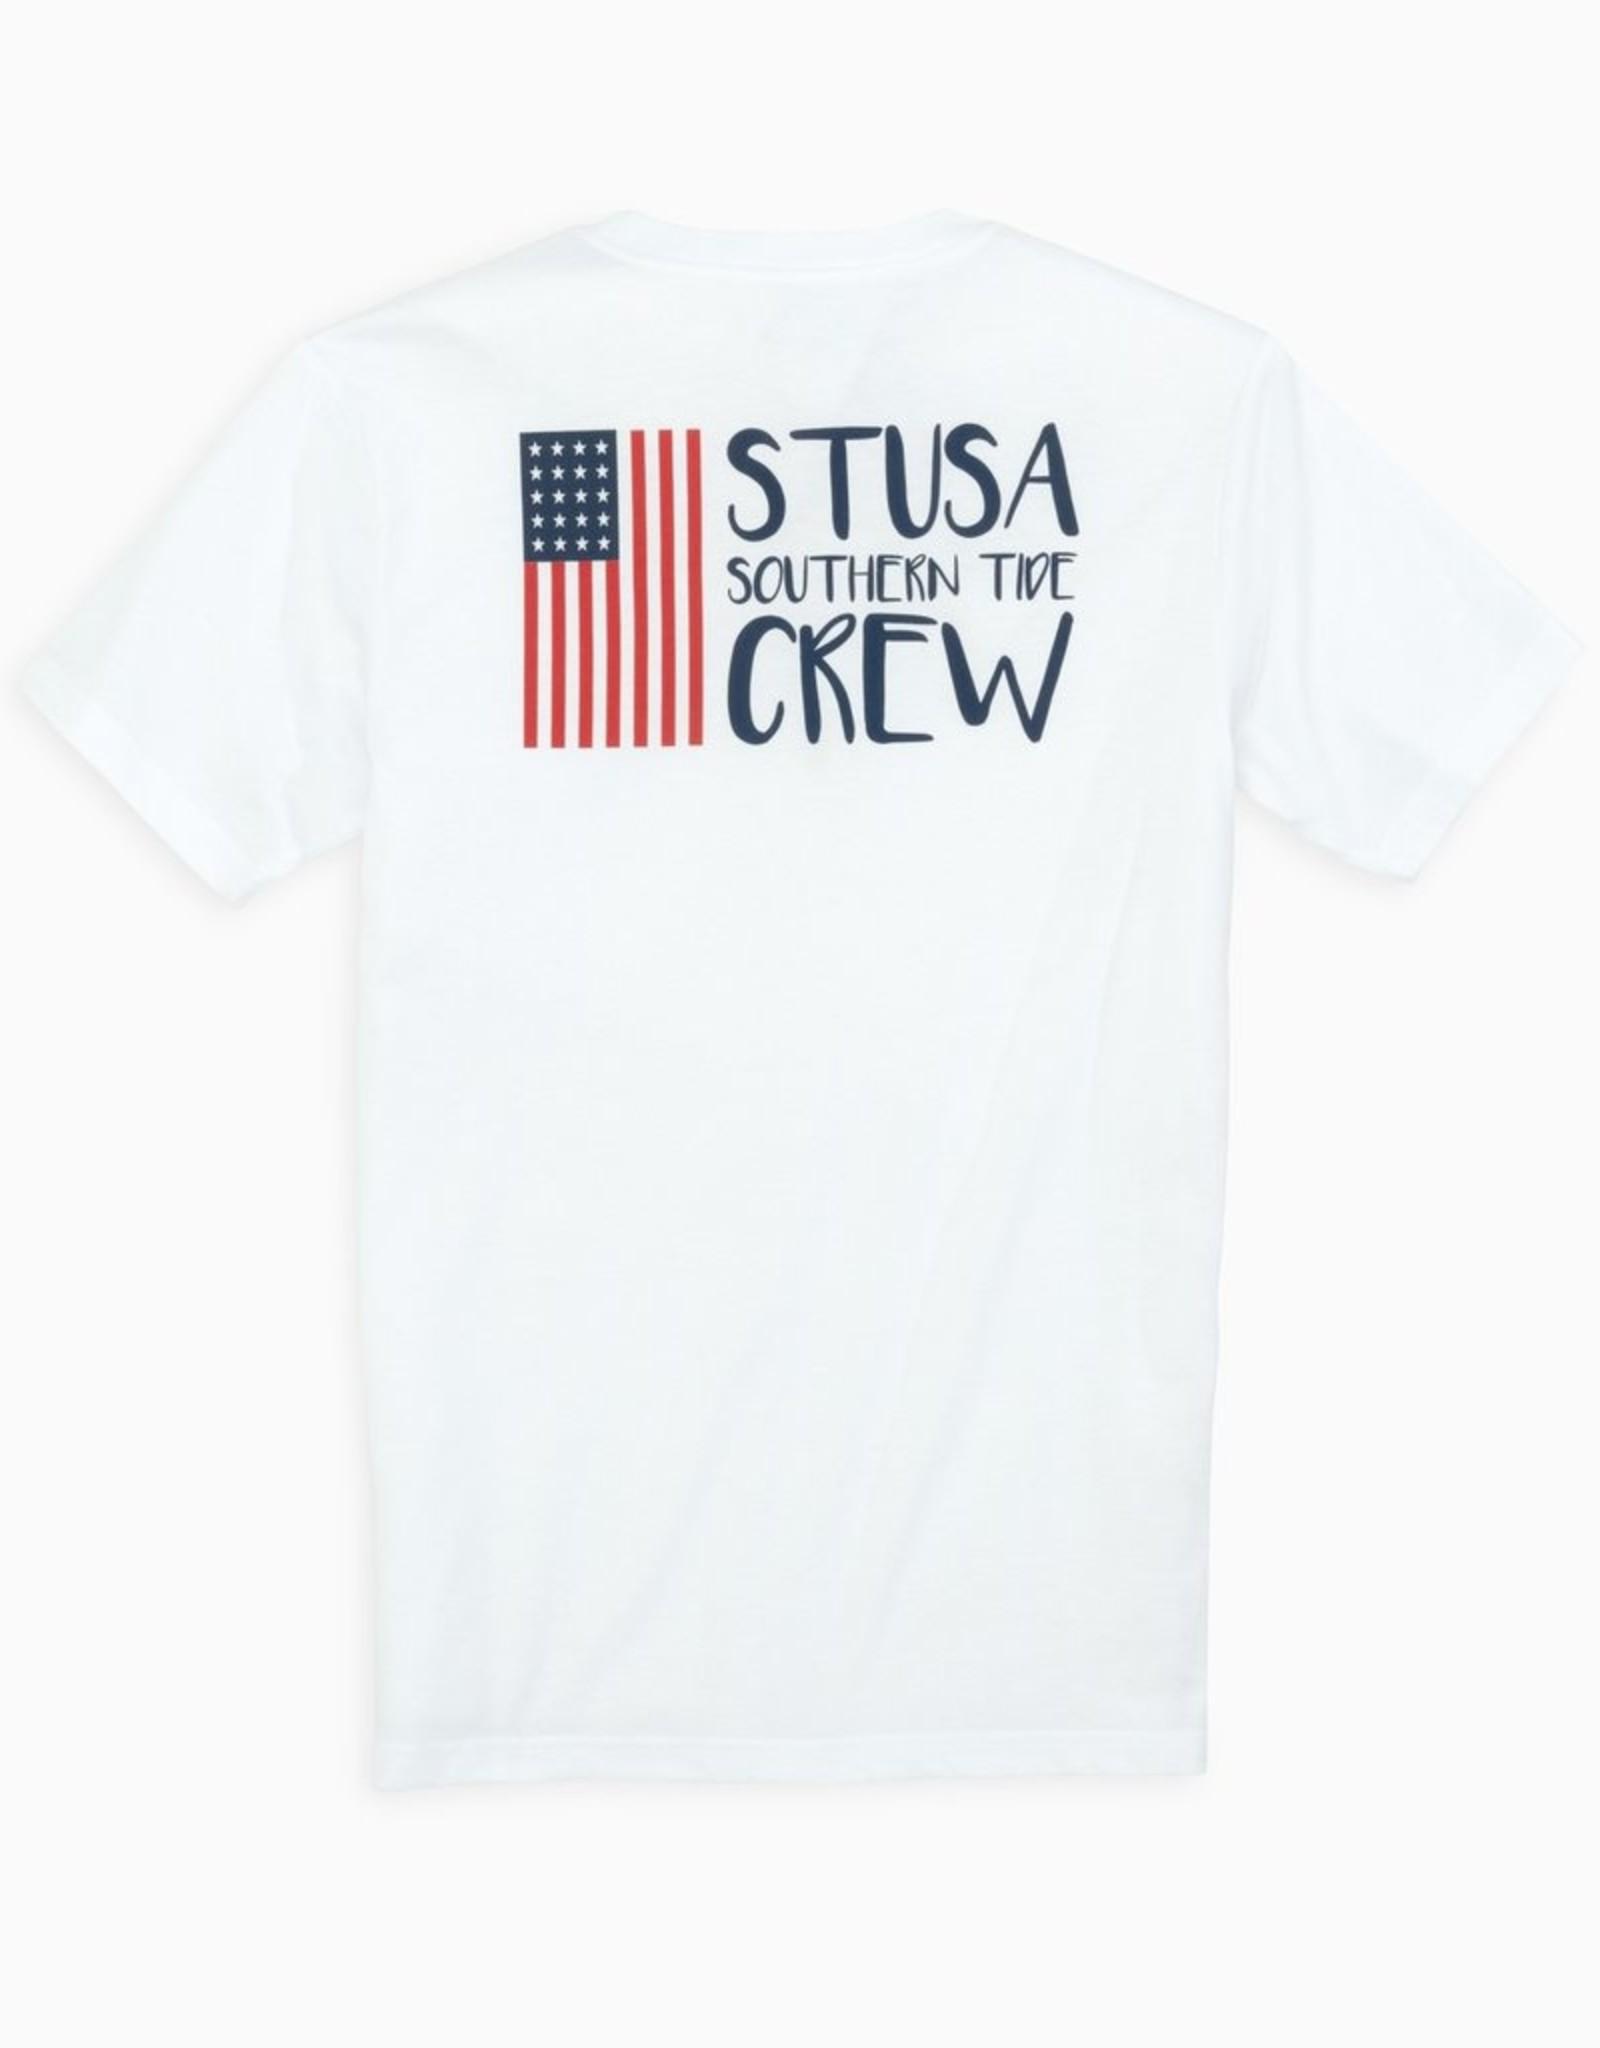 Southern Tide USA Crew Tee